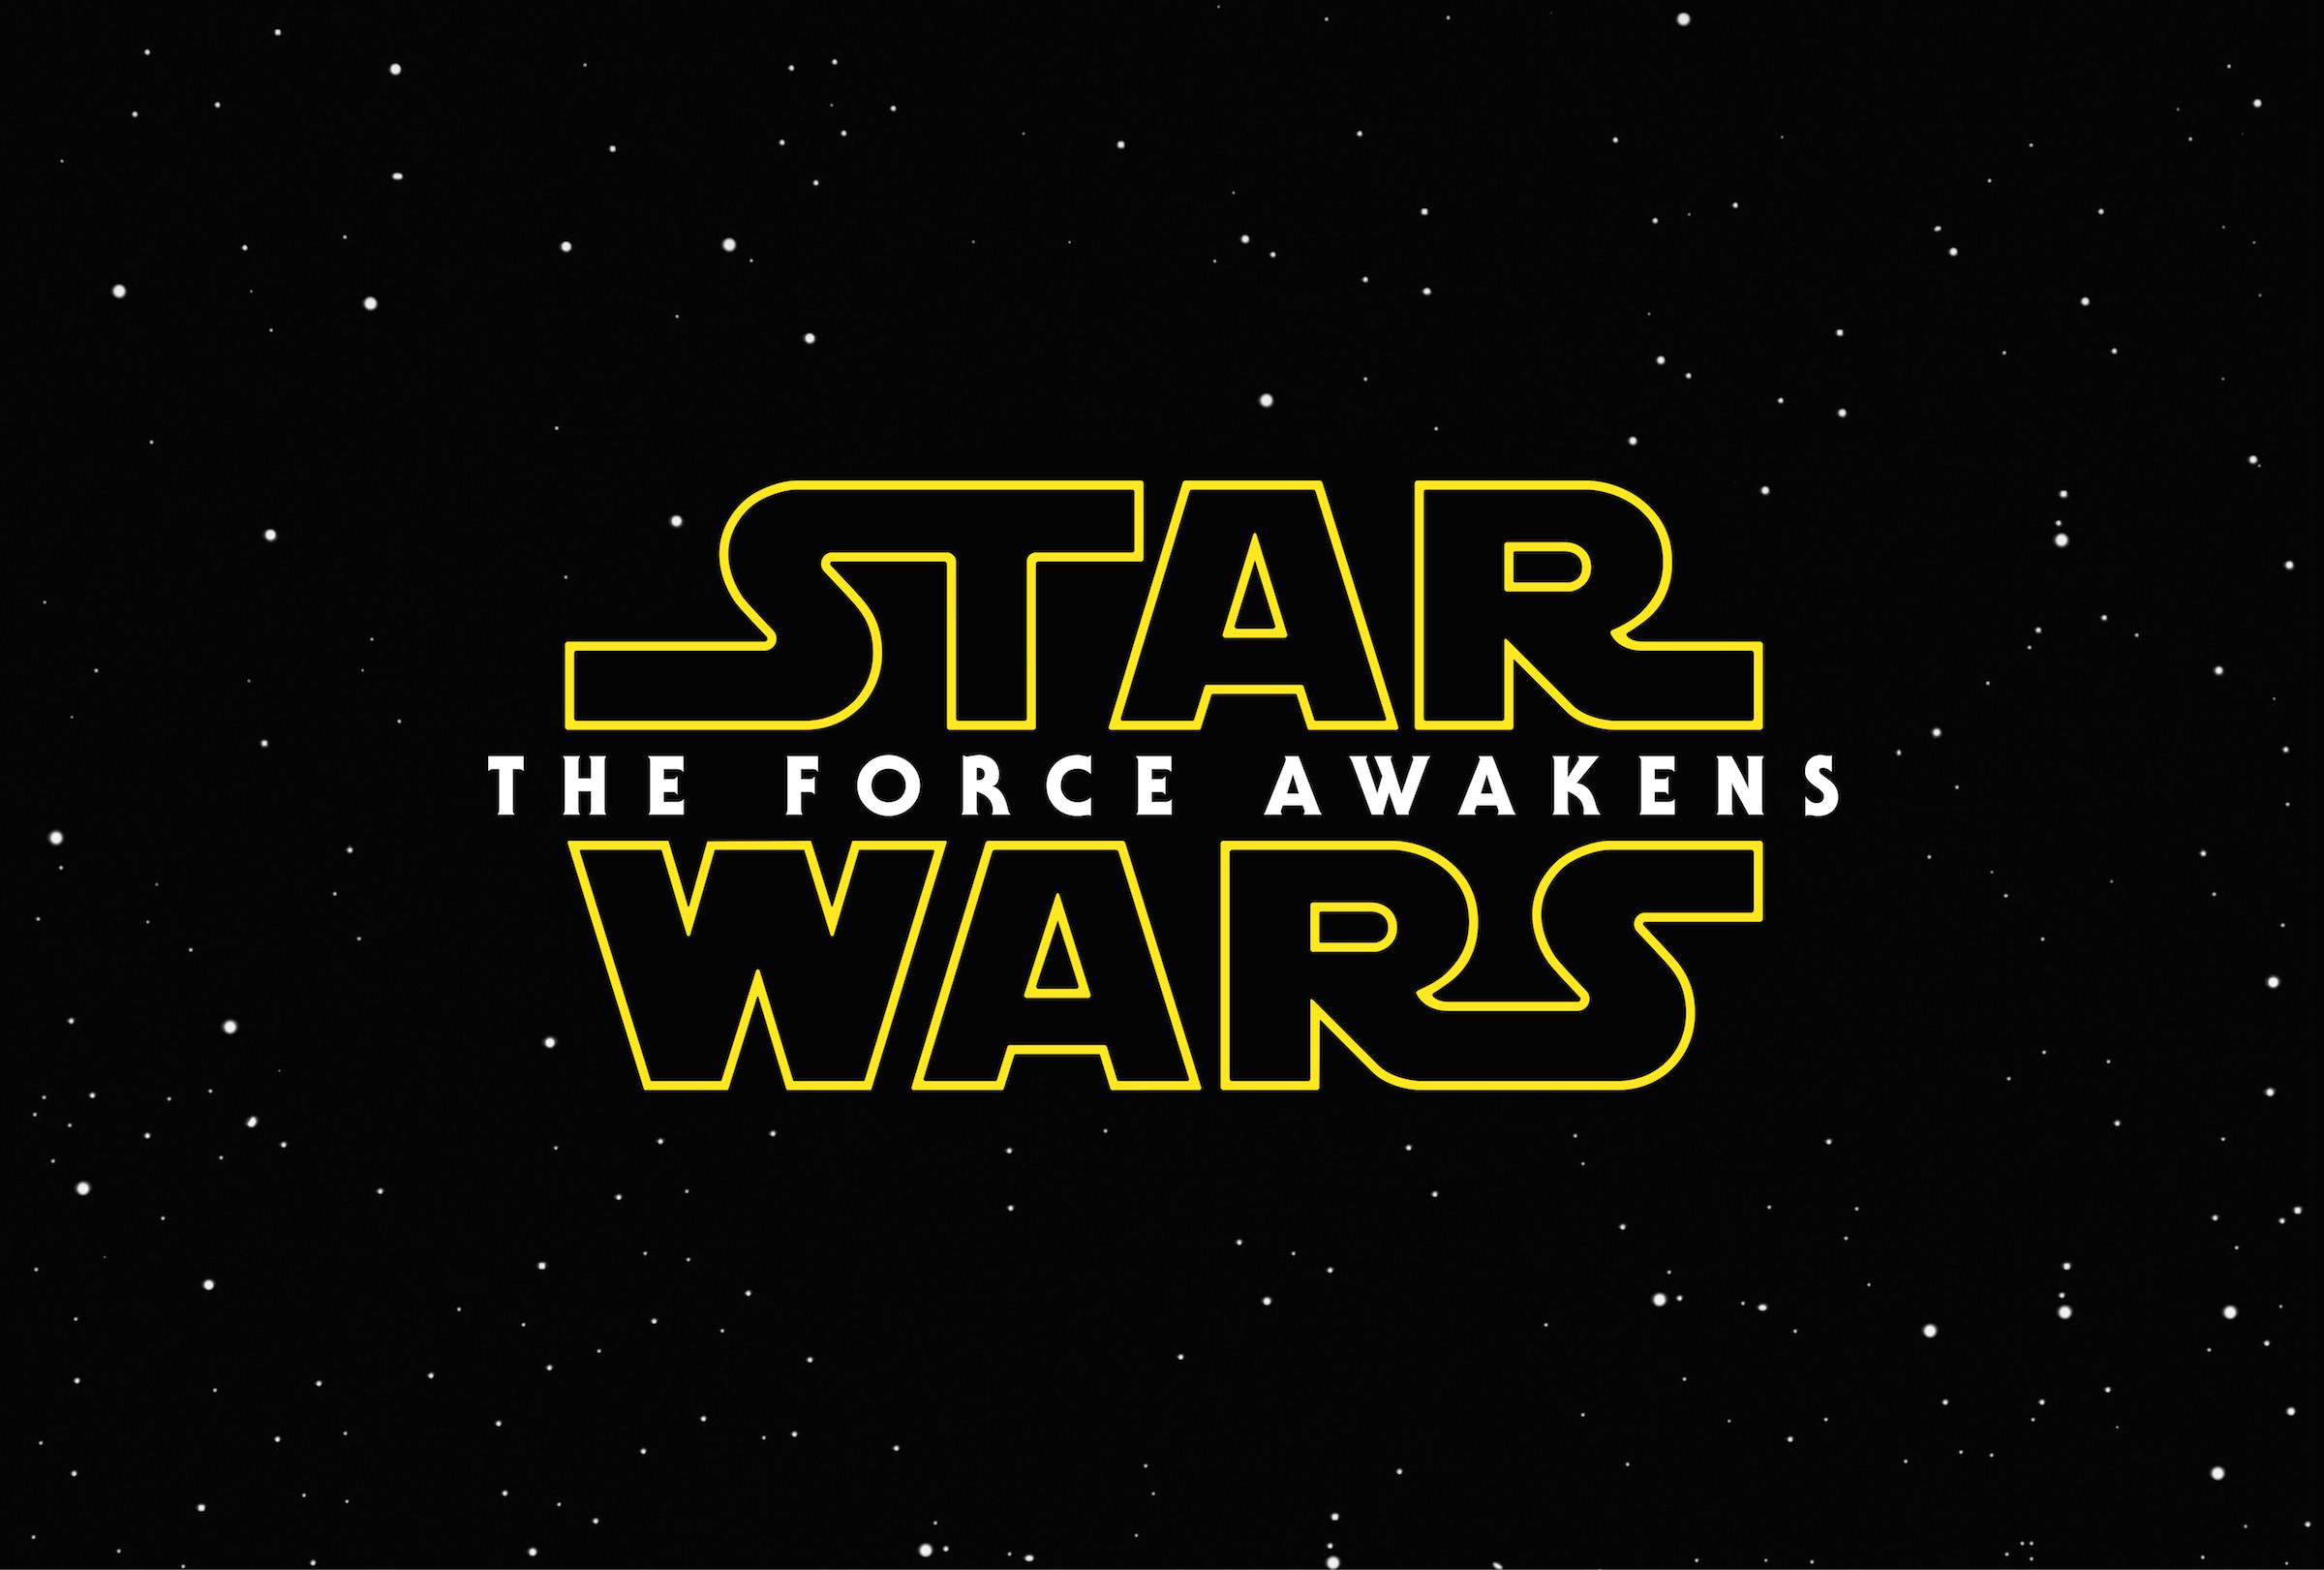 Force Awakens logo wallpaper small